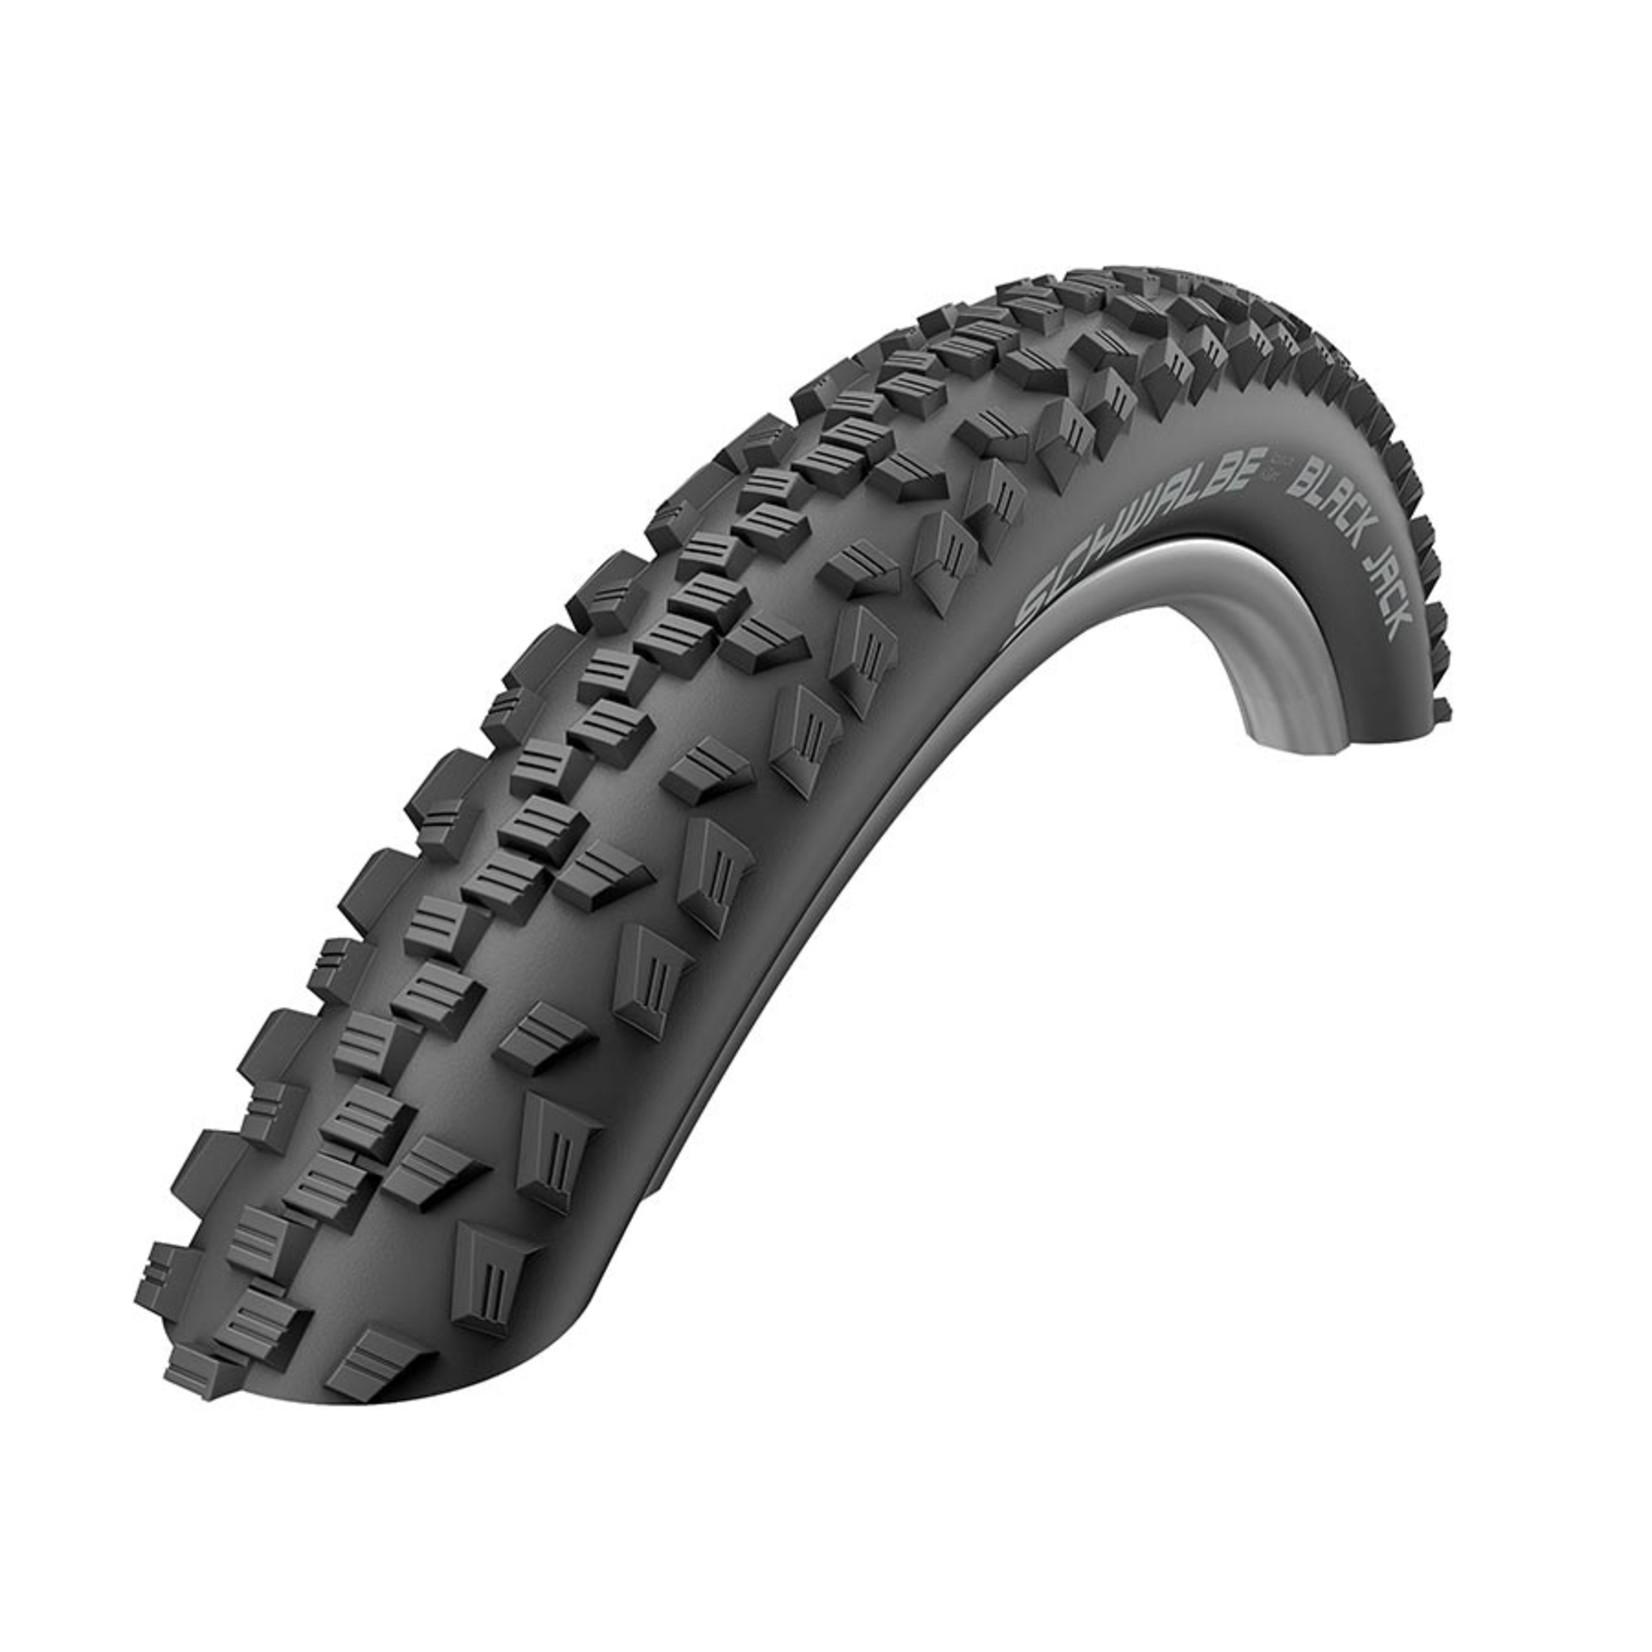 Schwalbe Schwalbe Black Jack 24x1.90 Wire Bead Tire